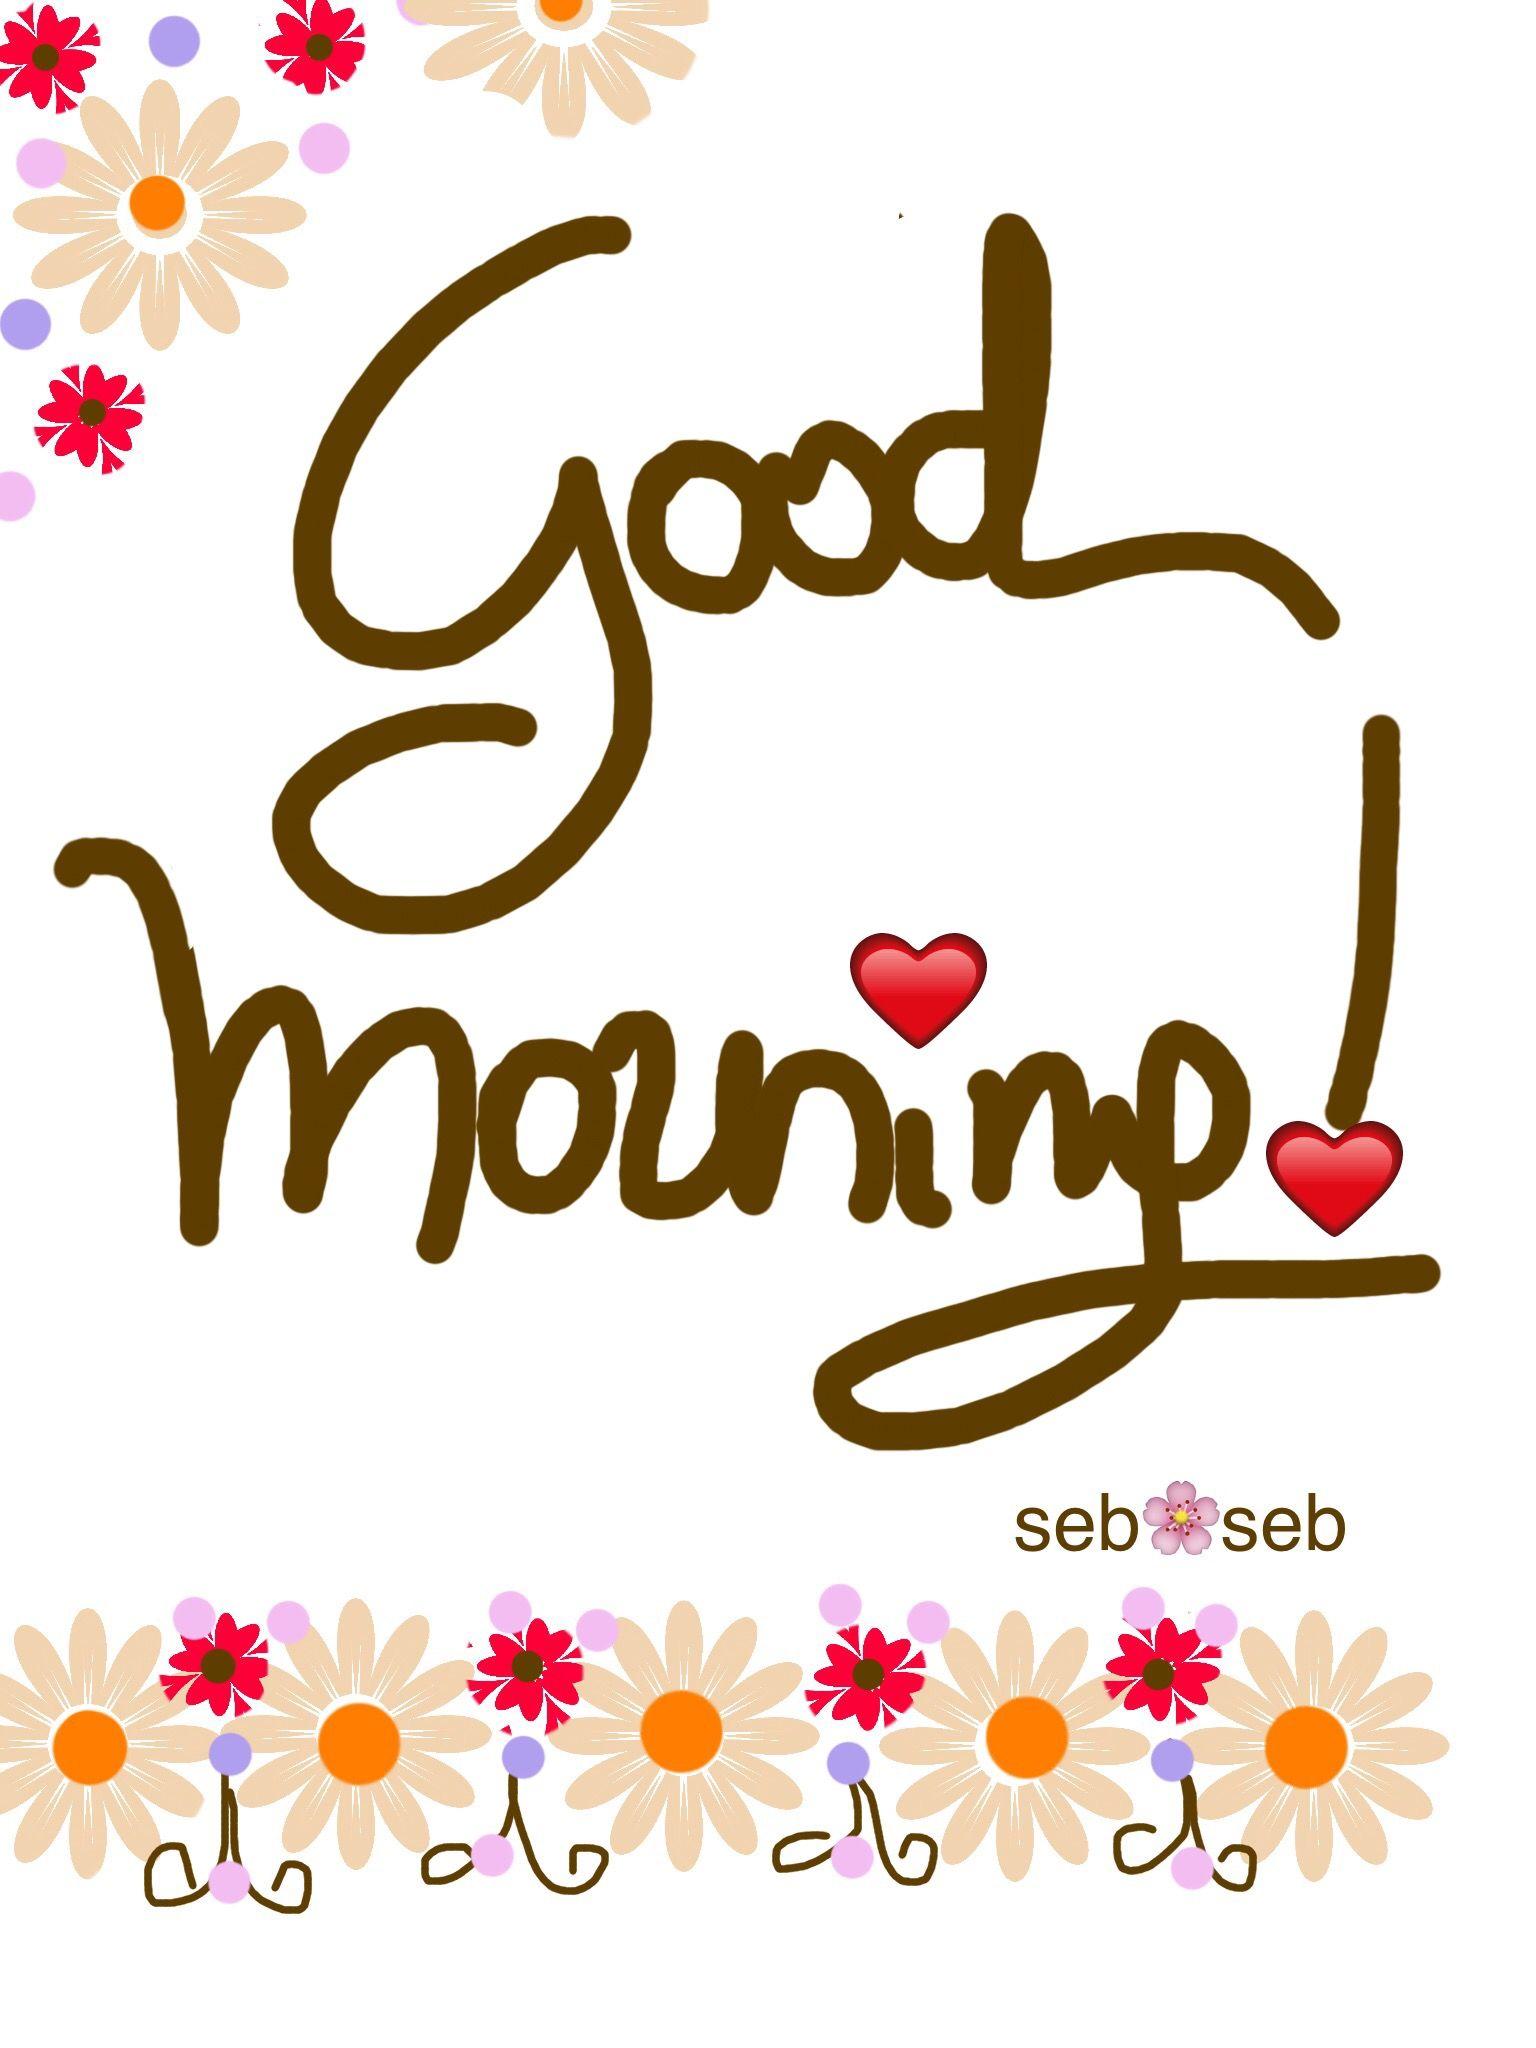 Seb 🌺   Good morning greetings, Good morning quotes, Good